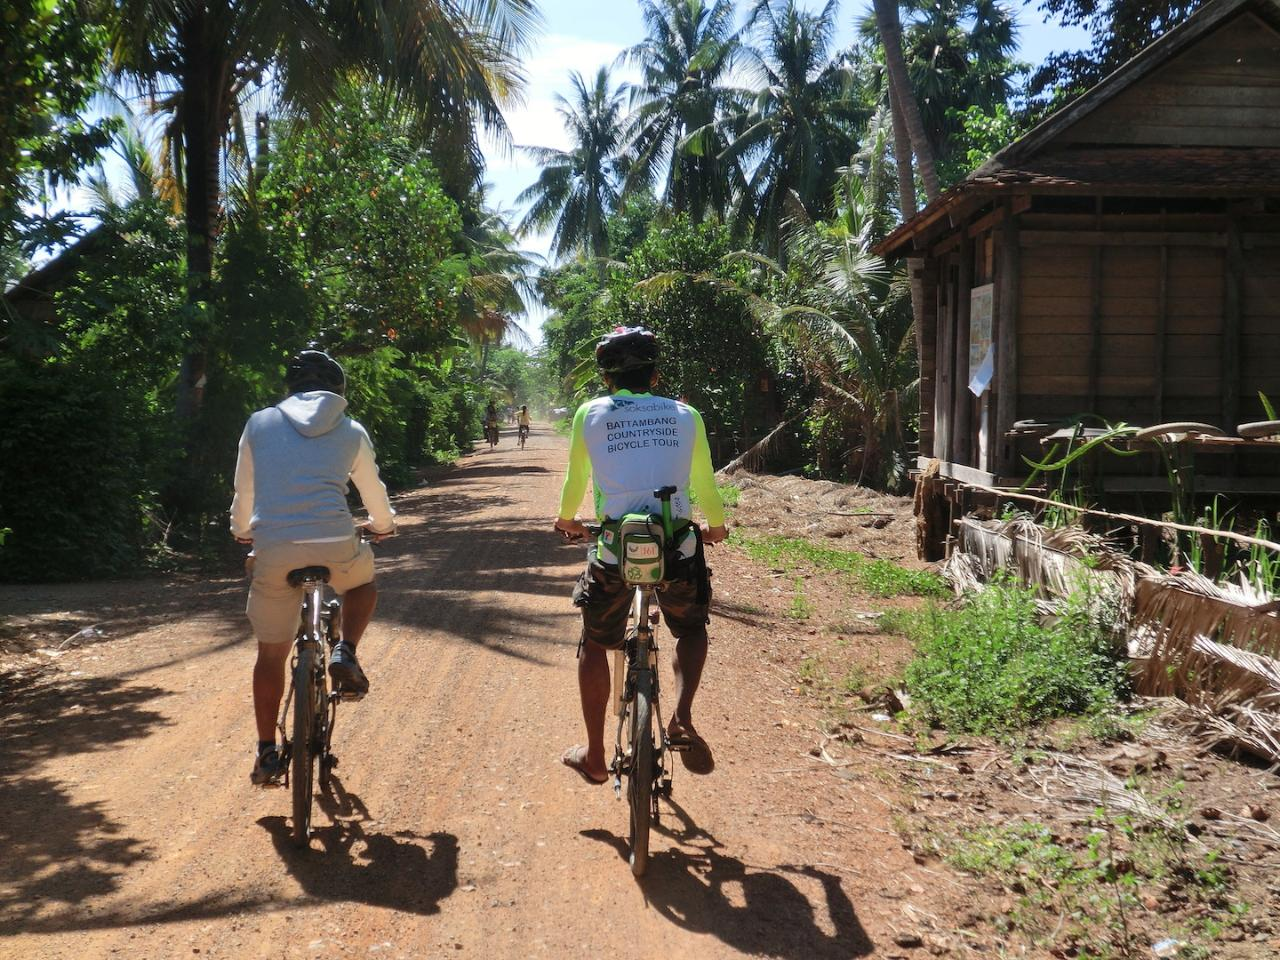 Ride in the Countryside Full Day Bike Tour in Battambang